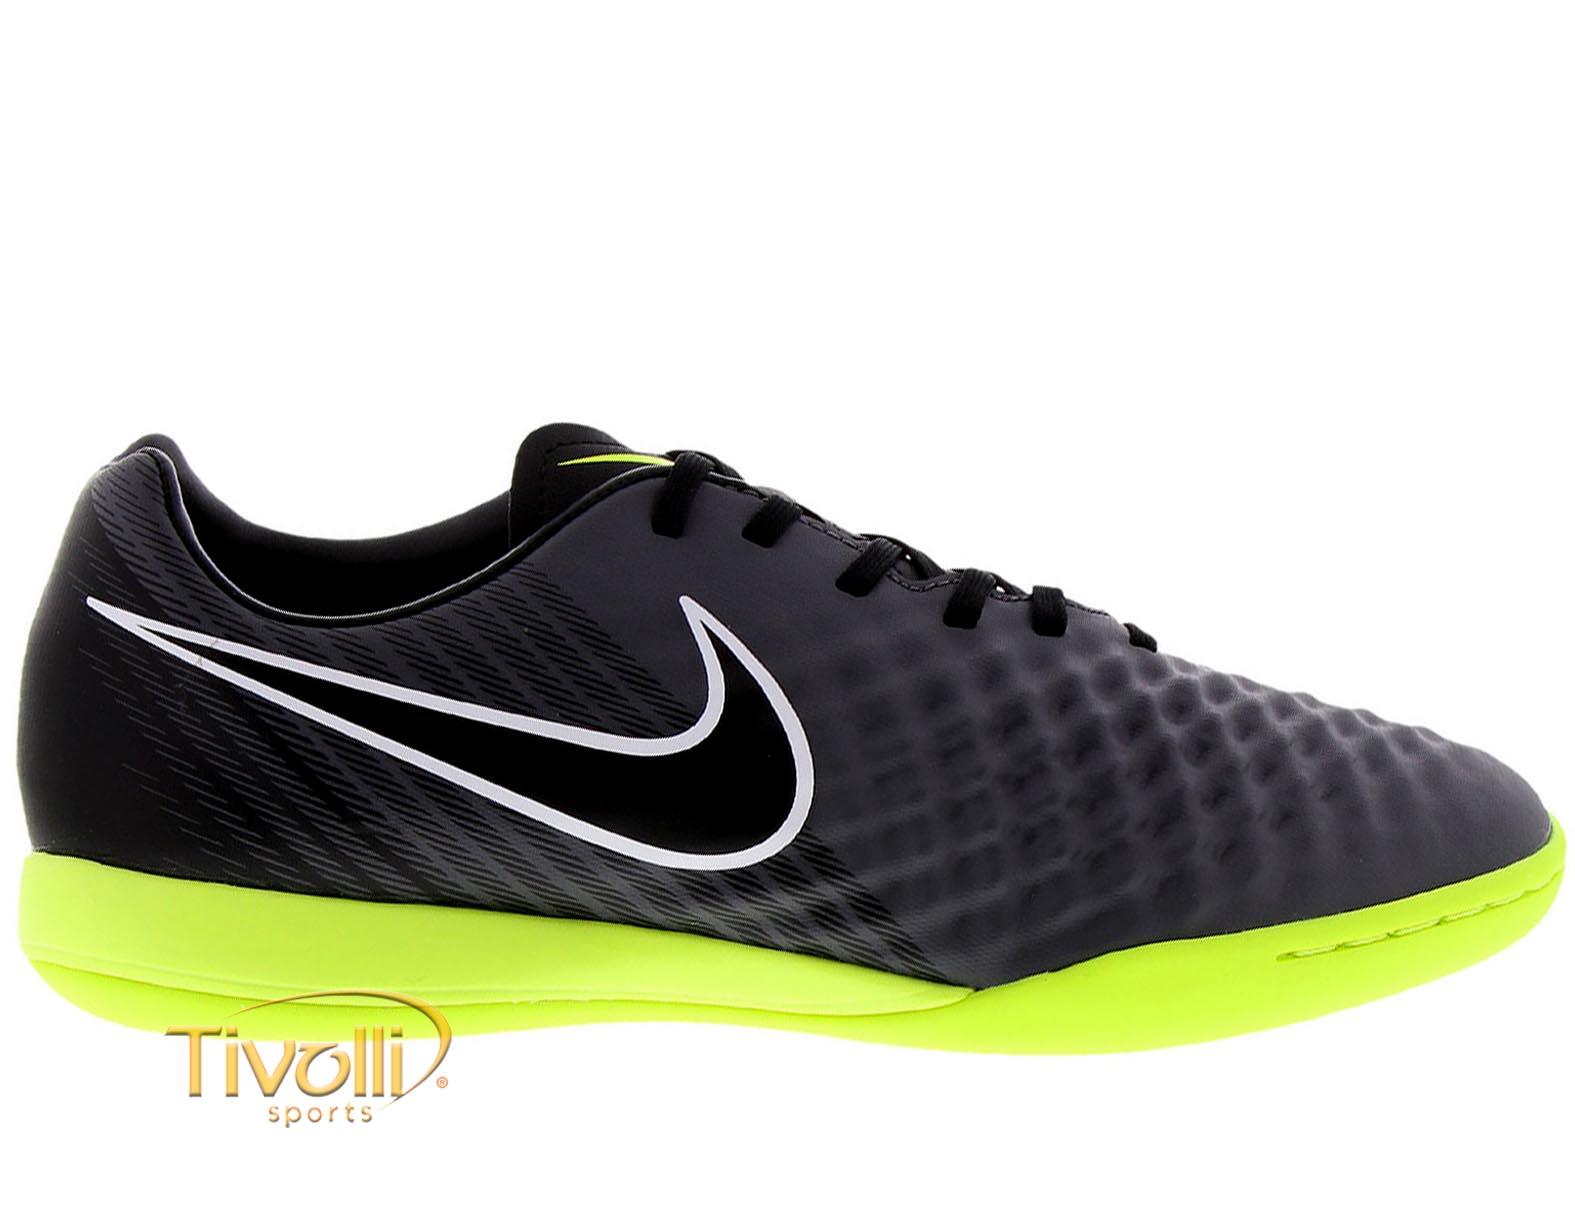 864a86801b Chuteira Nike MagistaX Onda II IC Futsal